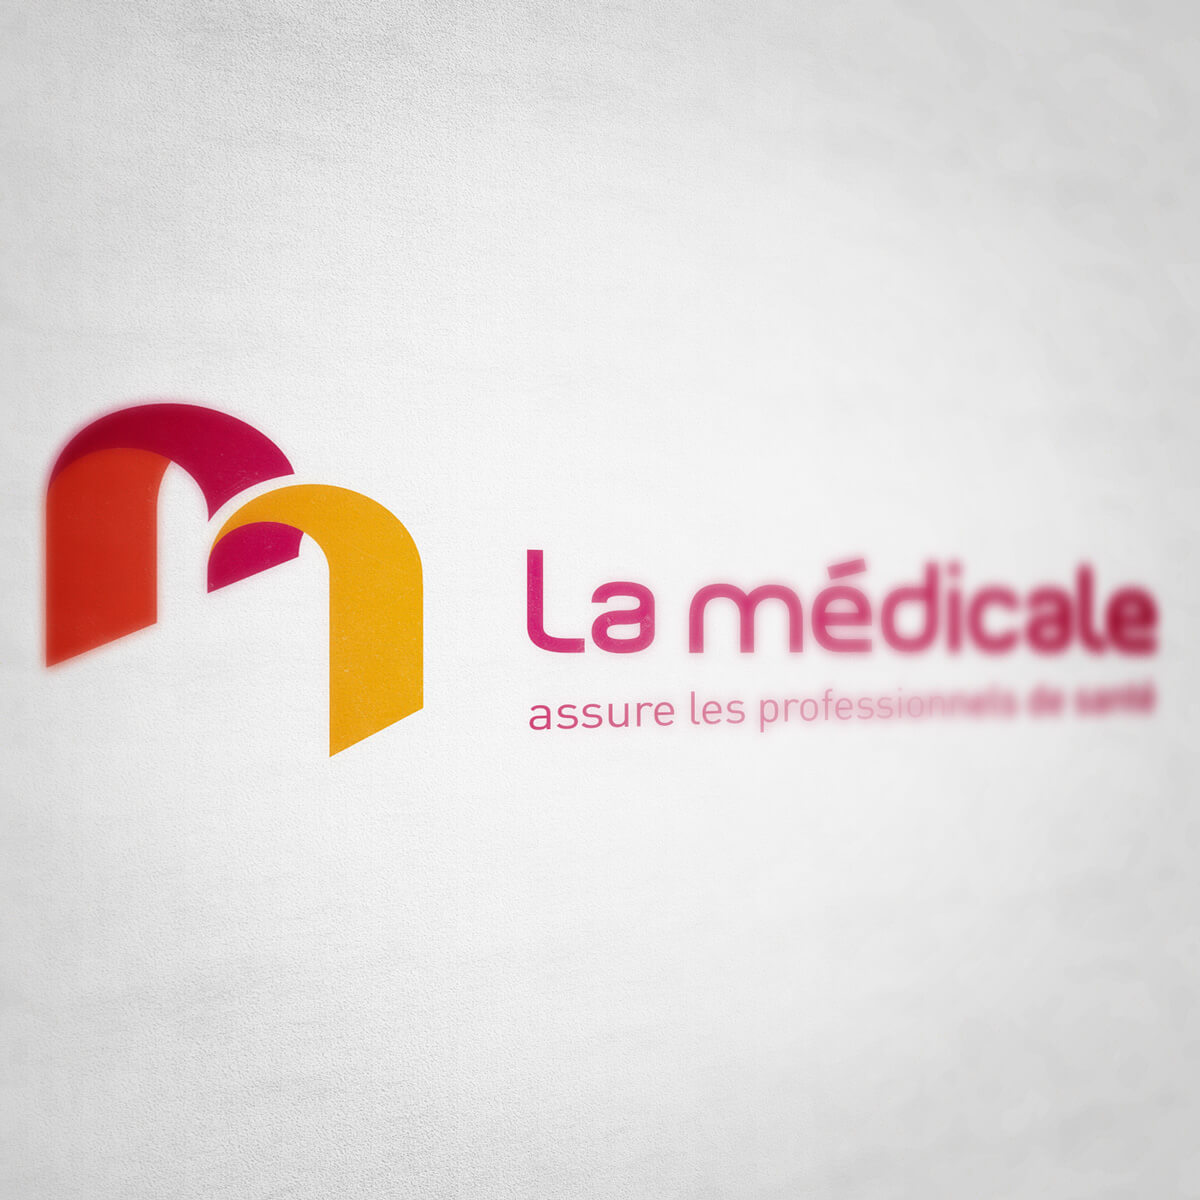 La médicale - Agence Celuga